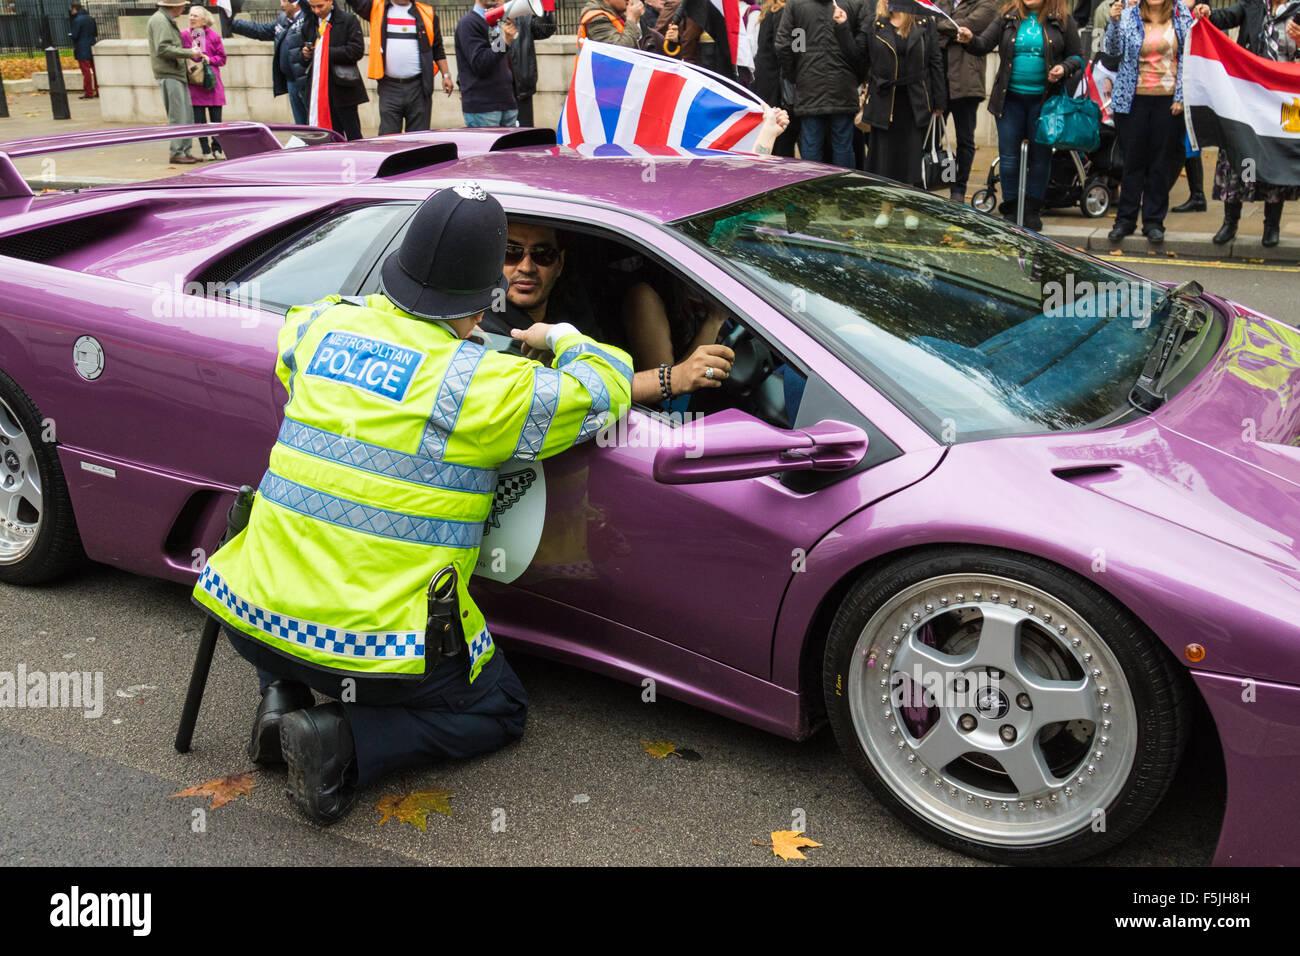 Whitehall, London, November 5th 2015. UK Egyptians demonstrate in support of President Abdel Fatah al-Sisi as supporters - Stock Image